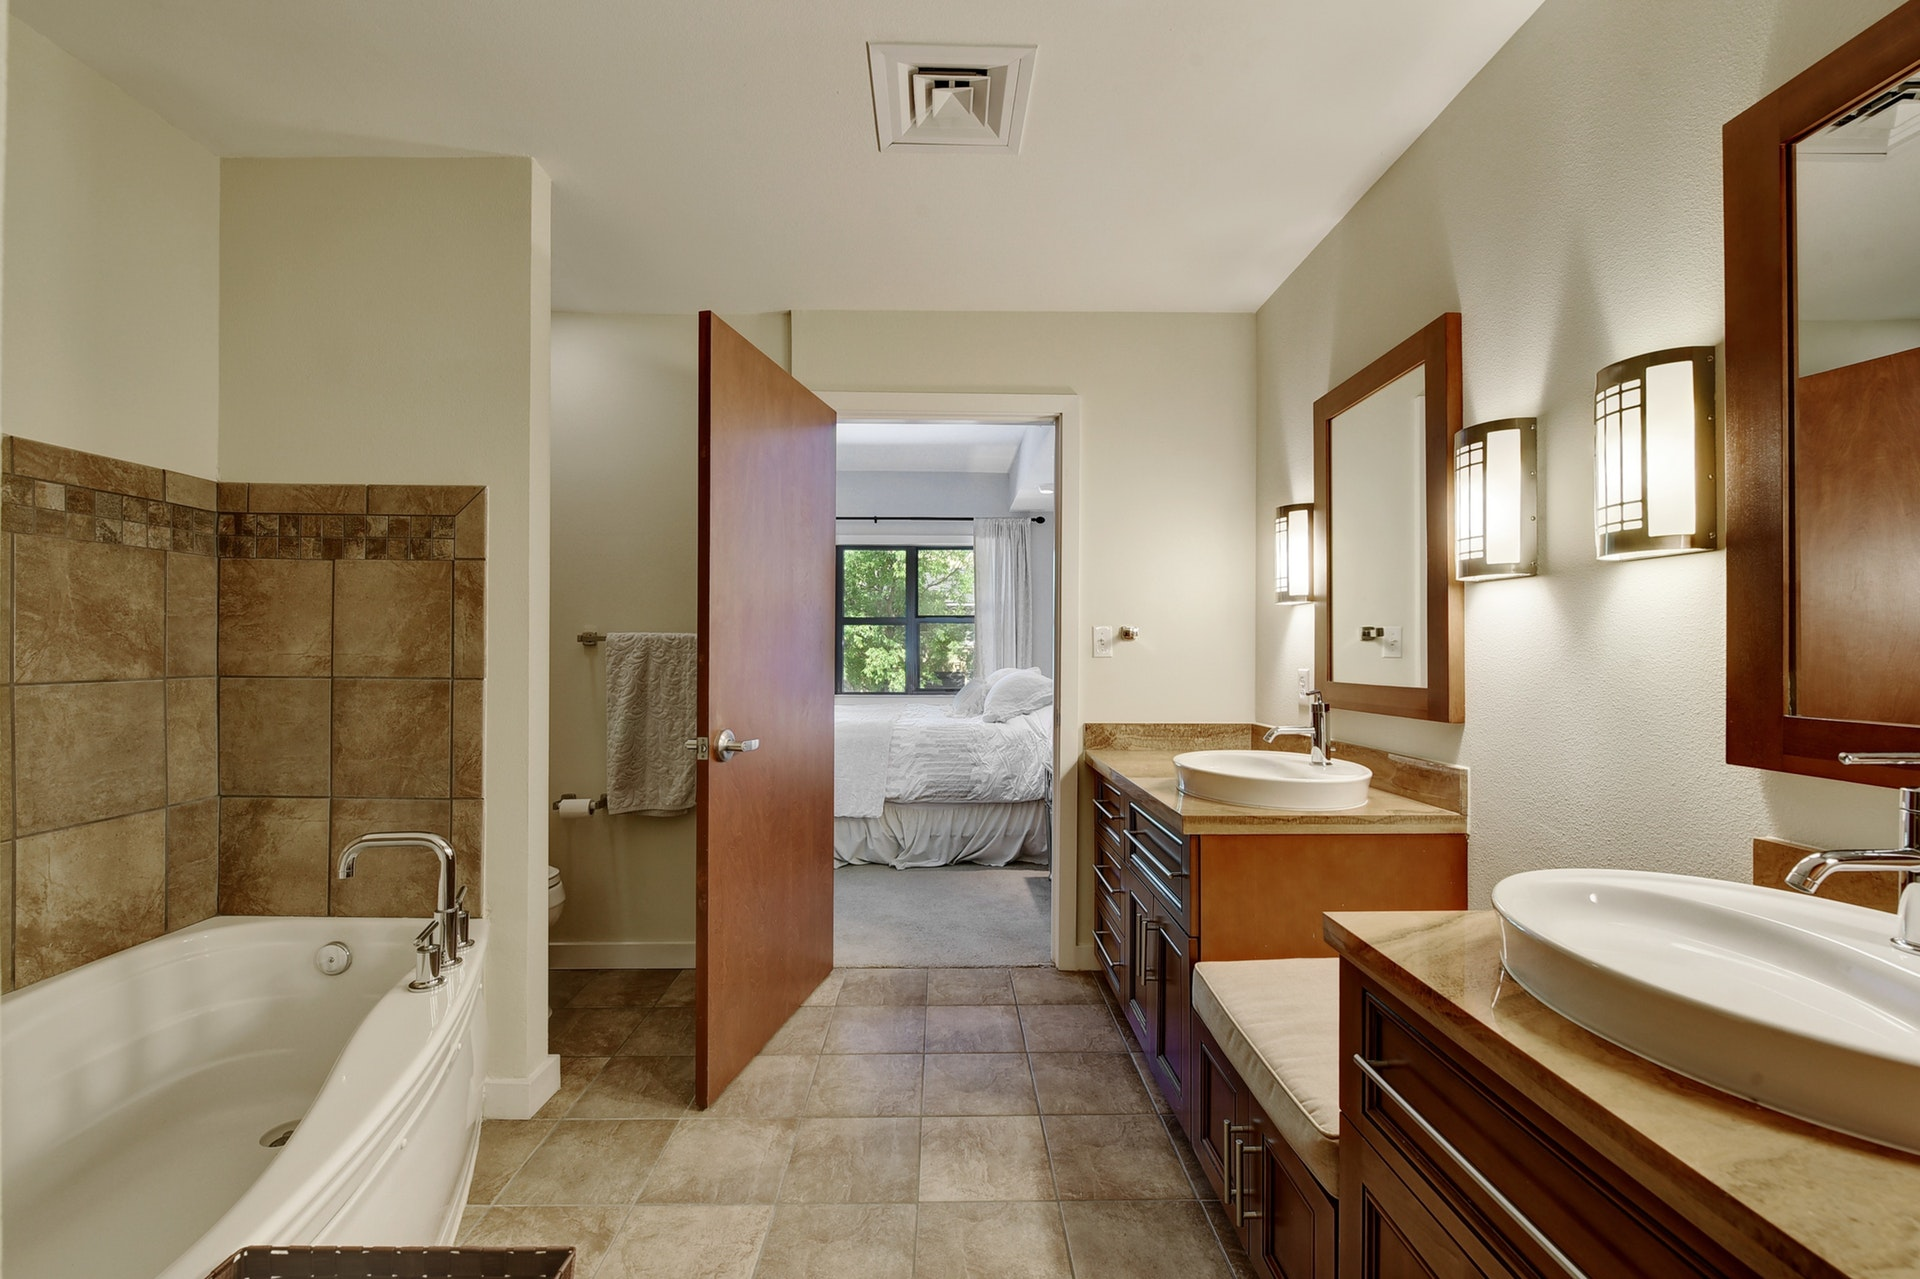 1812 West #306 - Master Bathroom